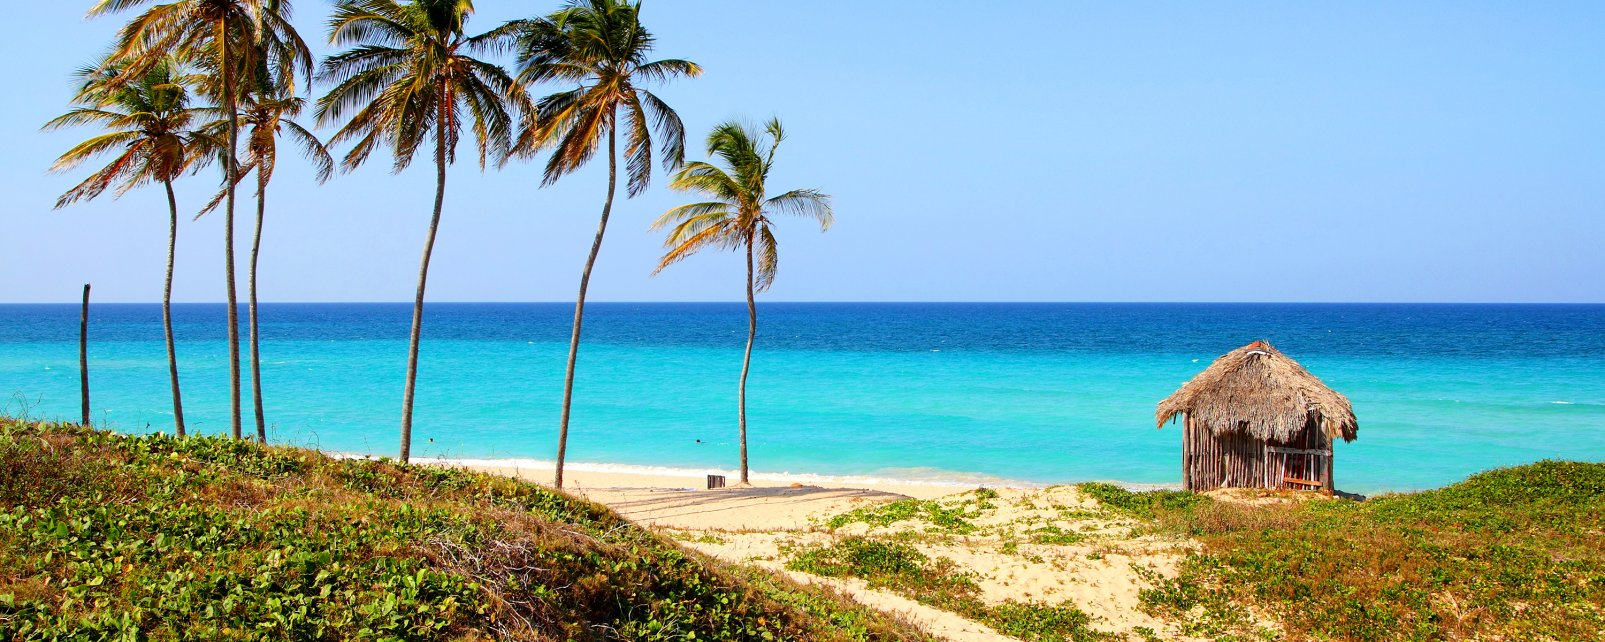 Havana's beaches, The beaches of Havana, Coasts, Havana, Cuba